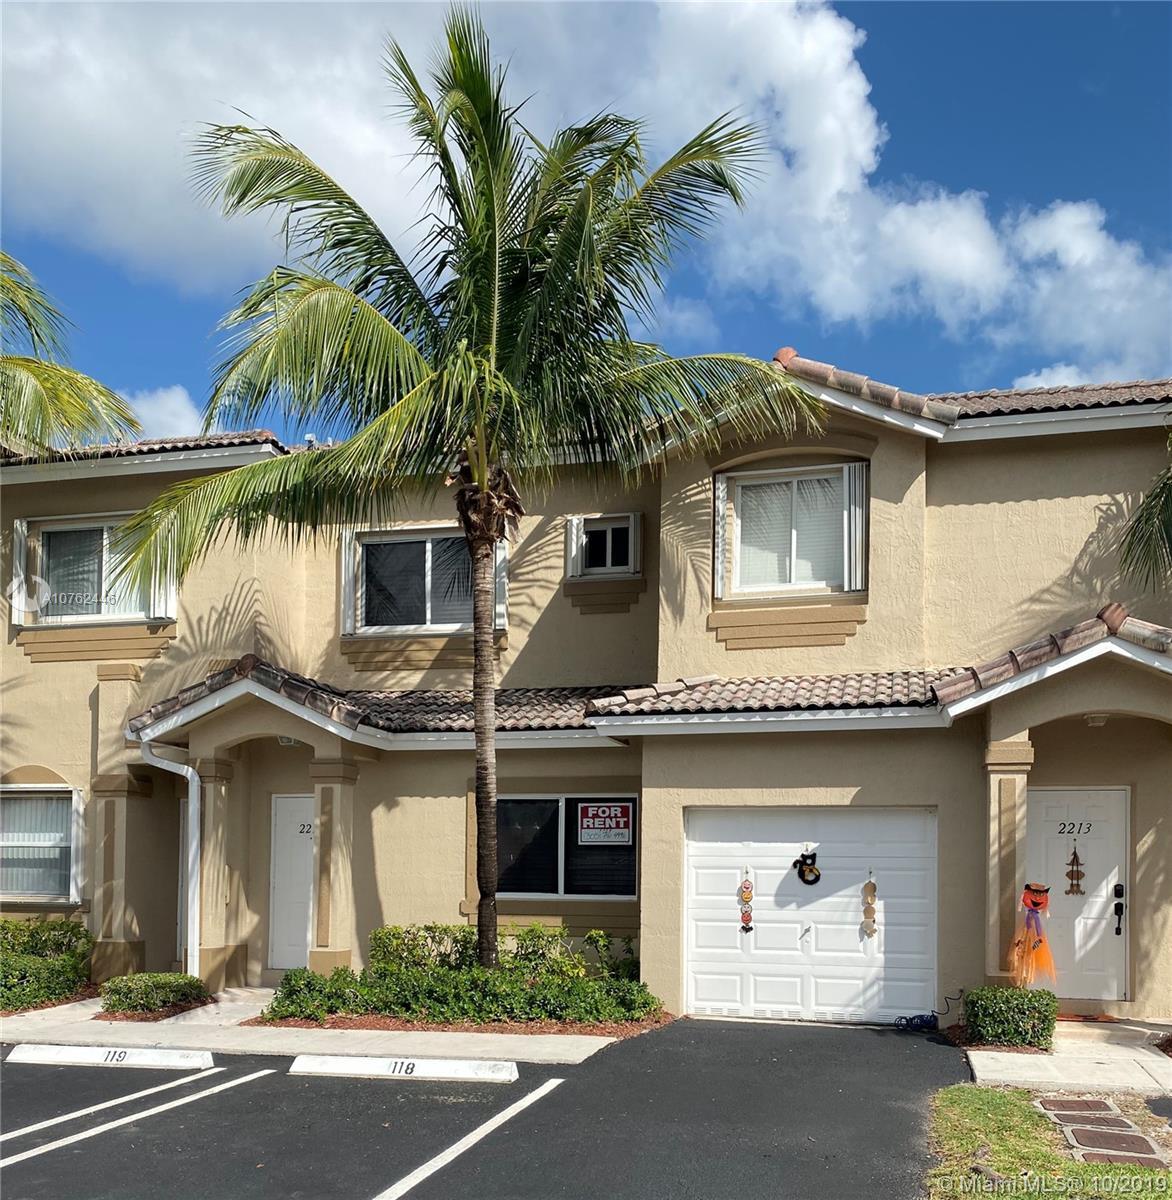 2215 SE 25th Ave #2215, Homestead, FL 33035 - Homestead, FL real estate listing